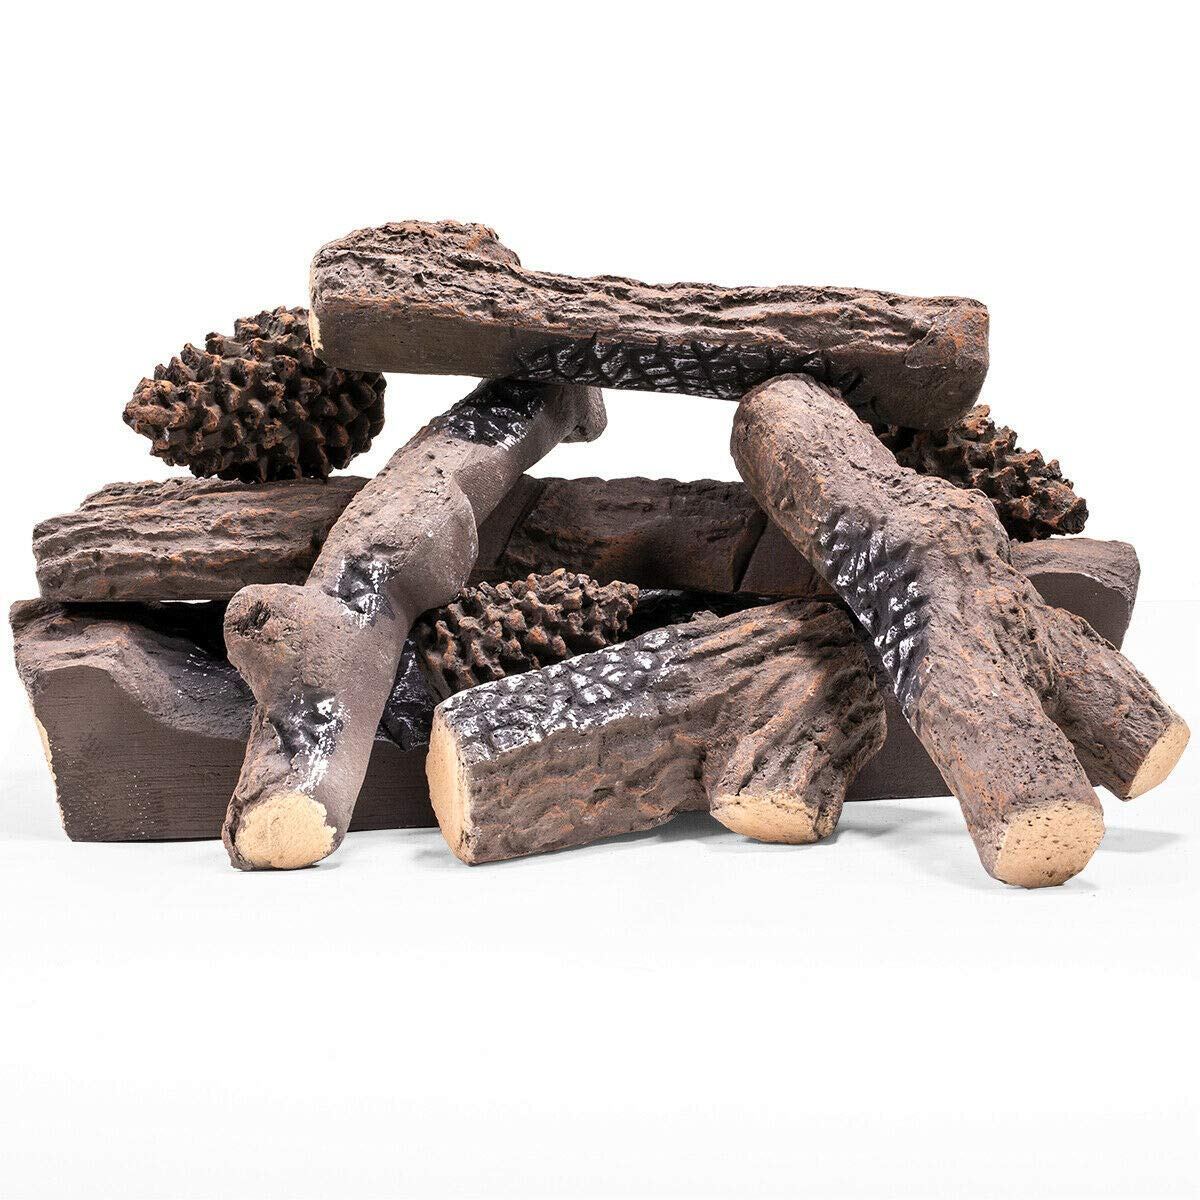 Realistic Decorative 9pc Ceramic Pine Wood Flame Firepit Woods Log 9-Pieces Set